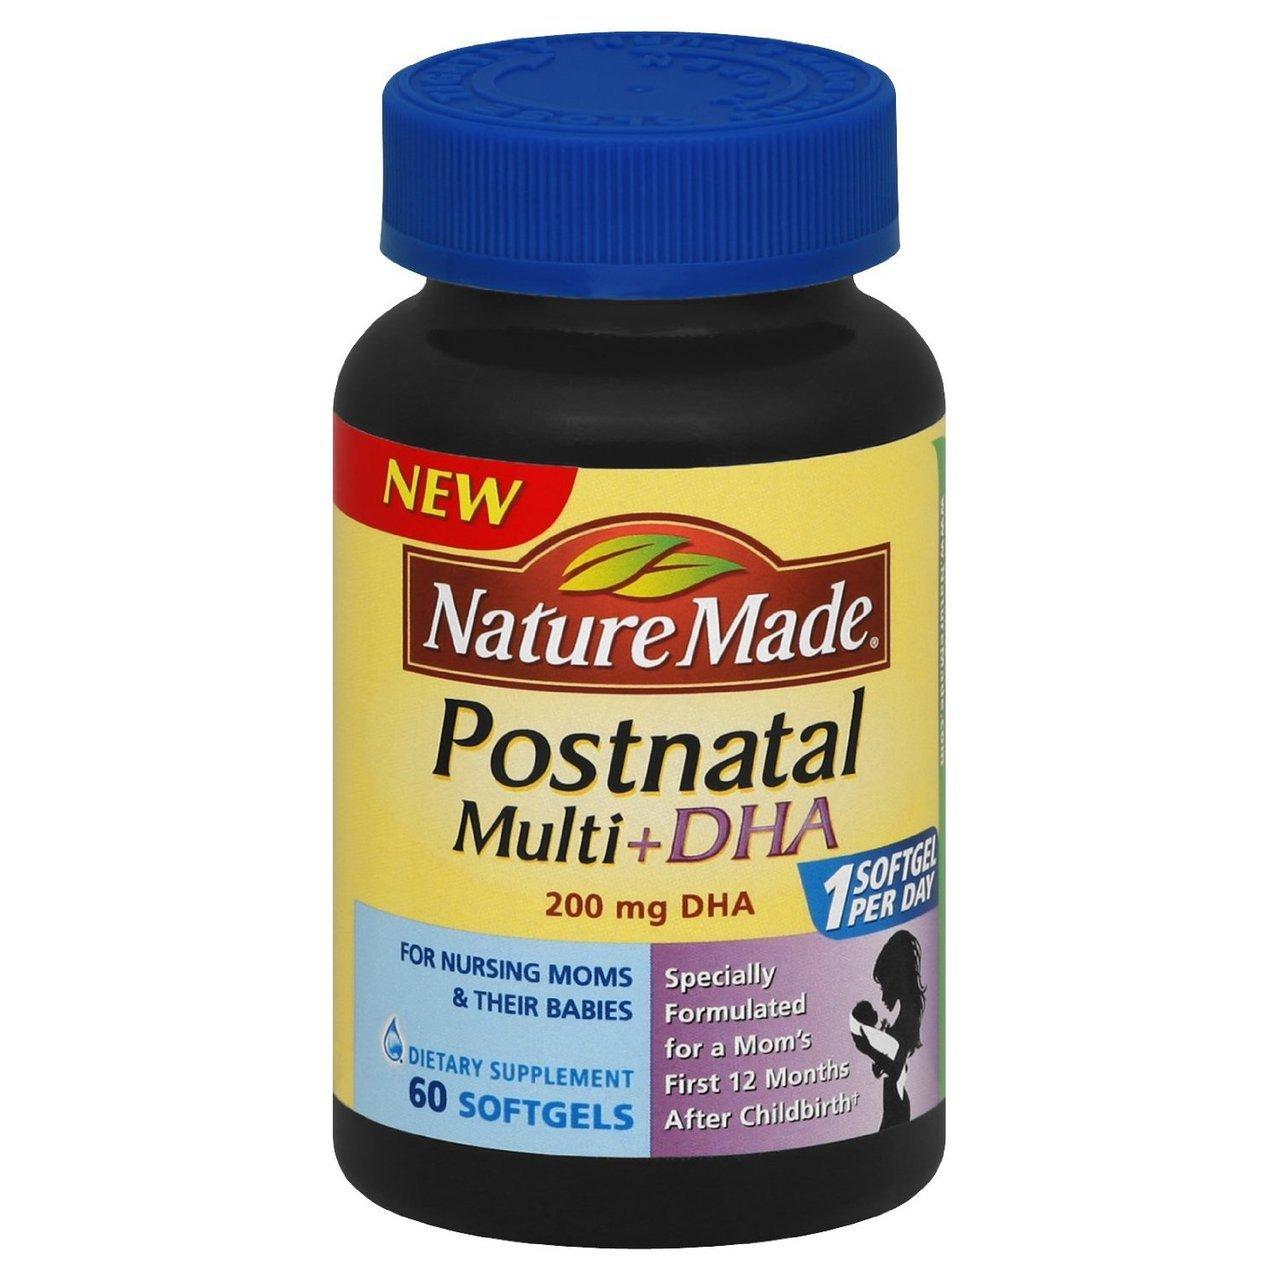 Nature Made Postnatal Multi + DHA (200 Mg) 60 Softgels (2 Pack)